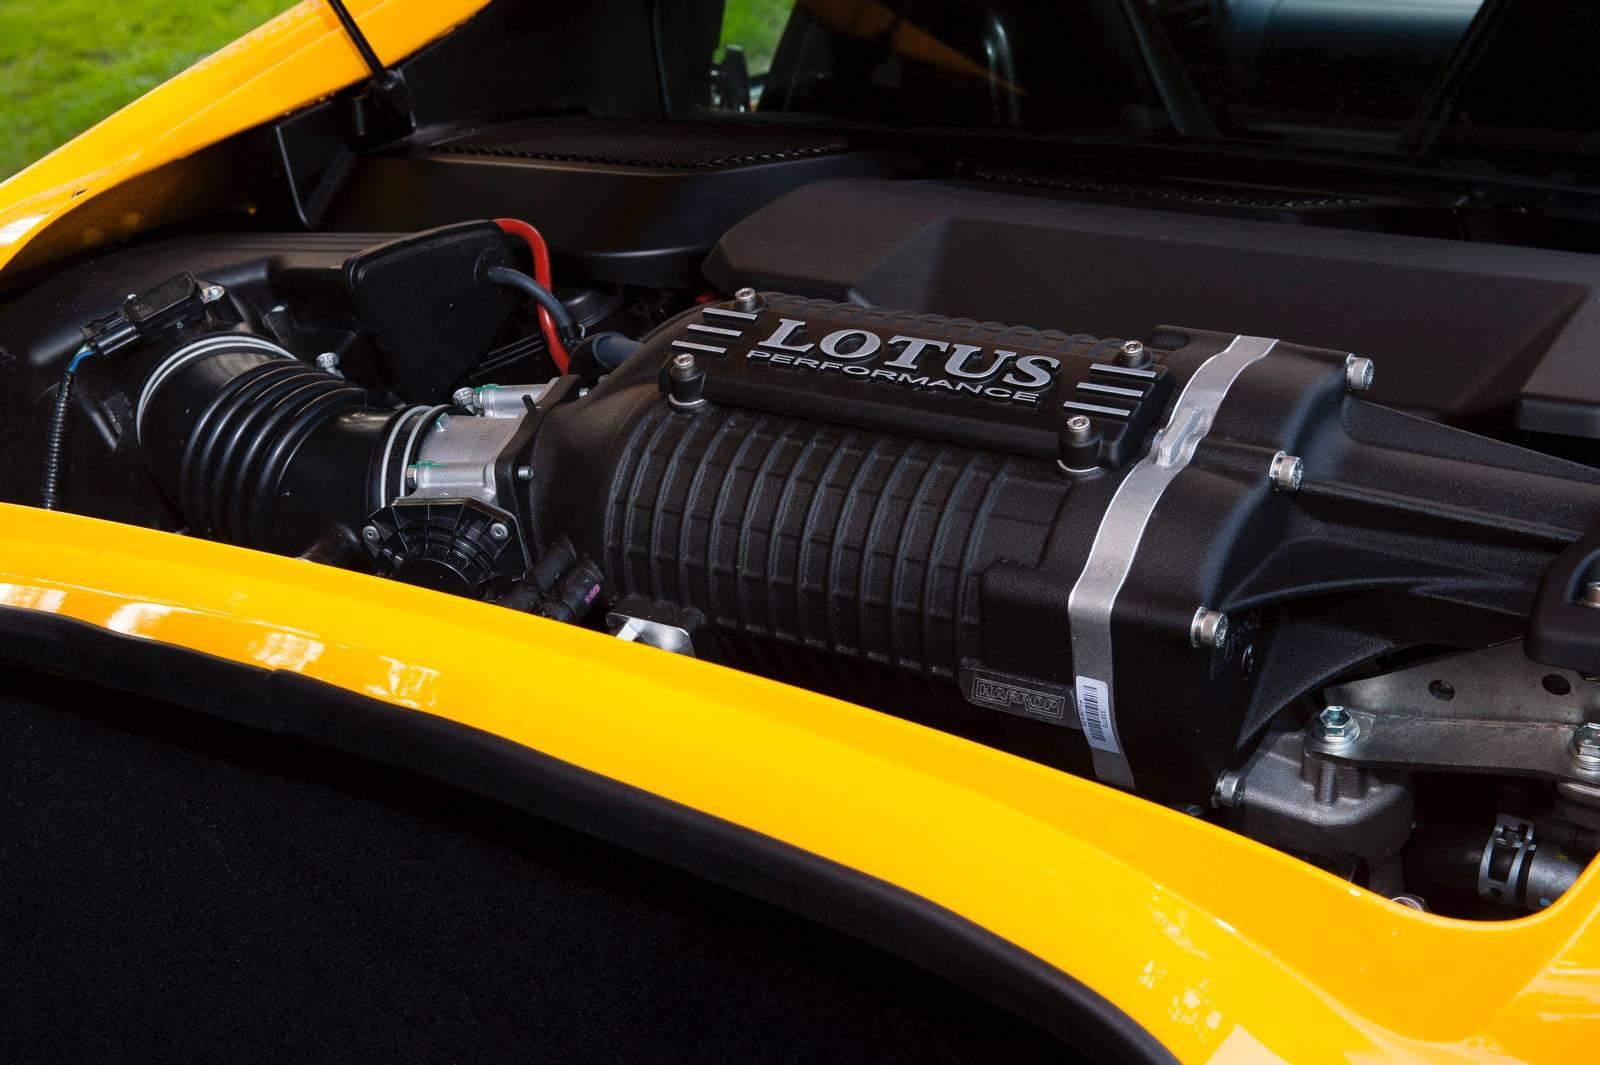 Third Generation Lotus Exige - This Is Lotus Exige Sport 350 7